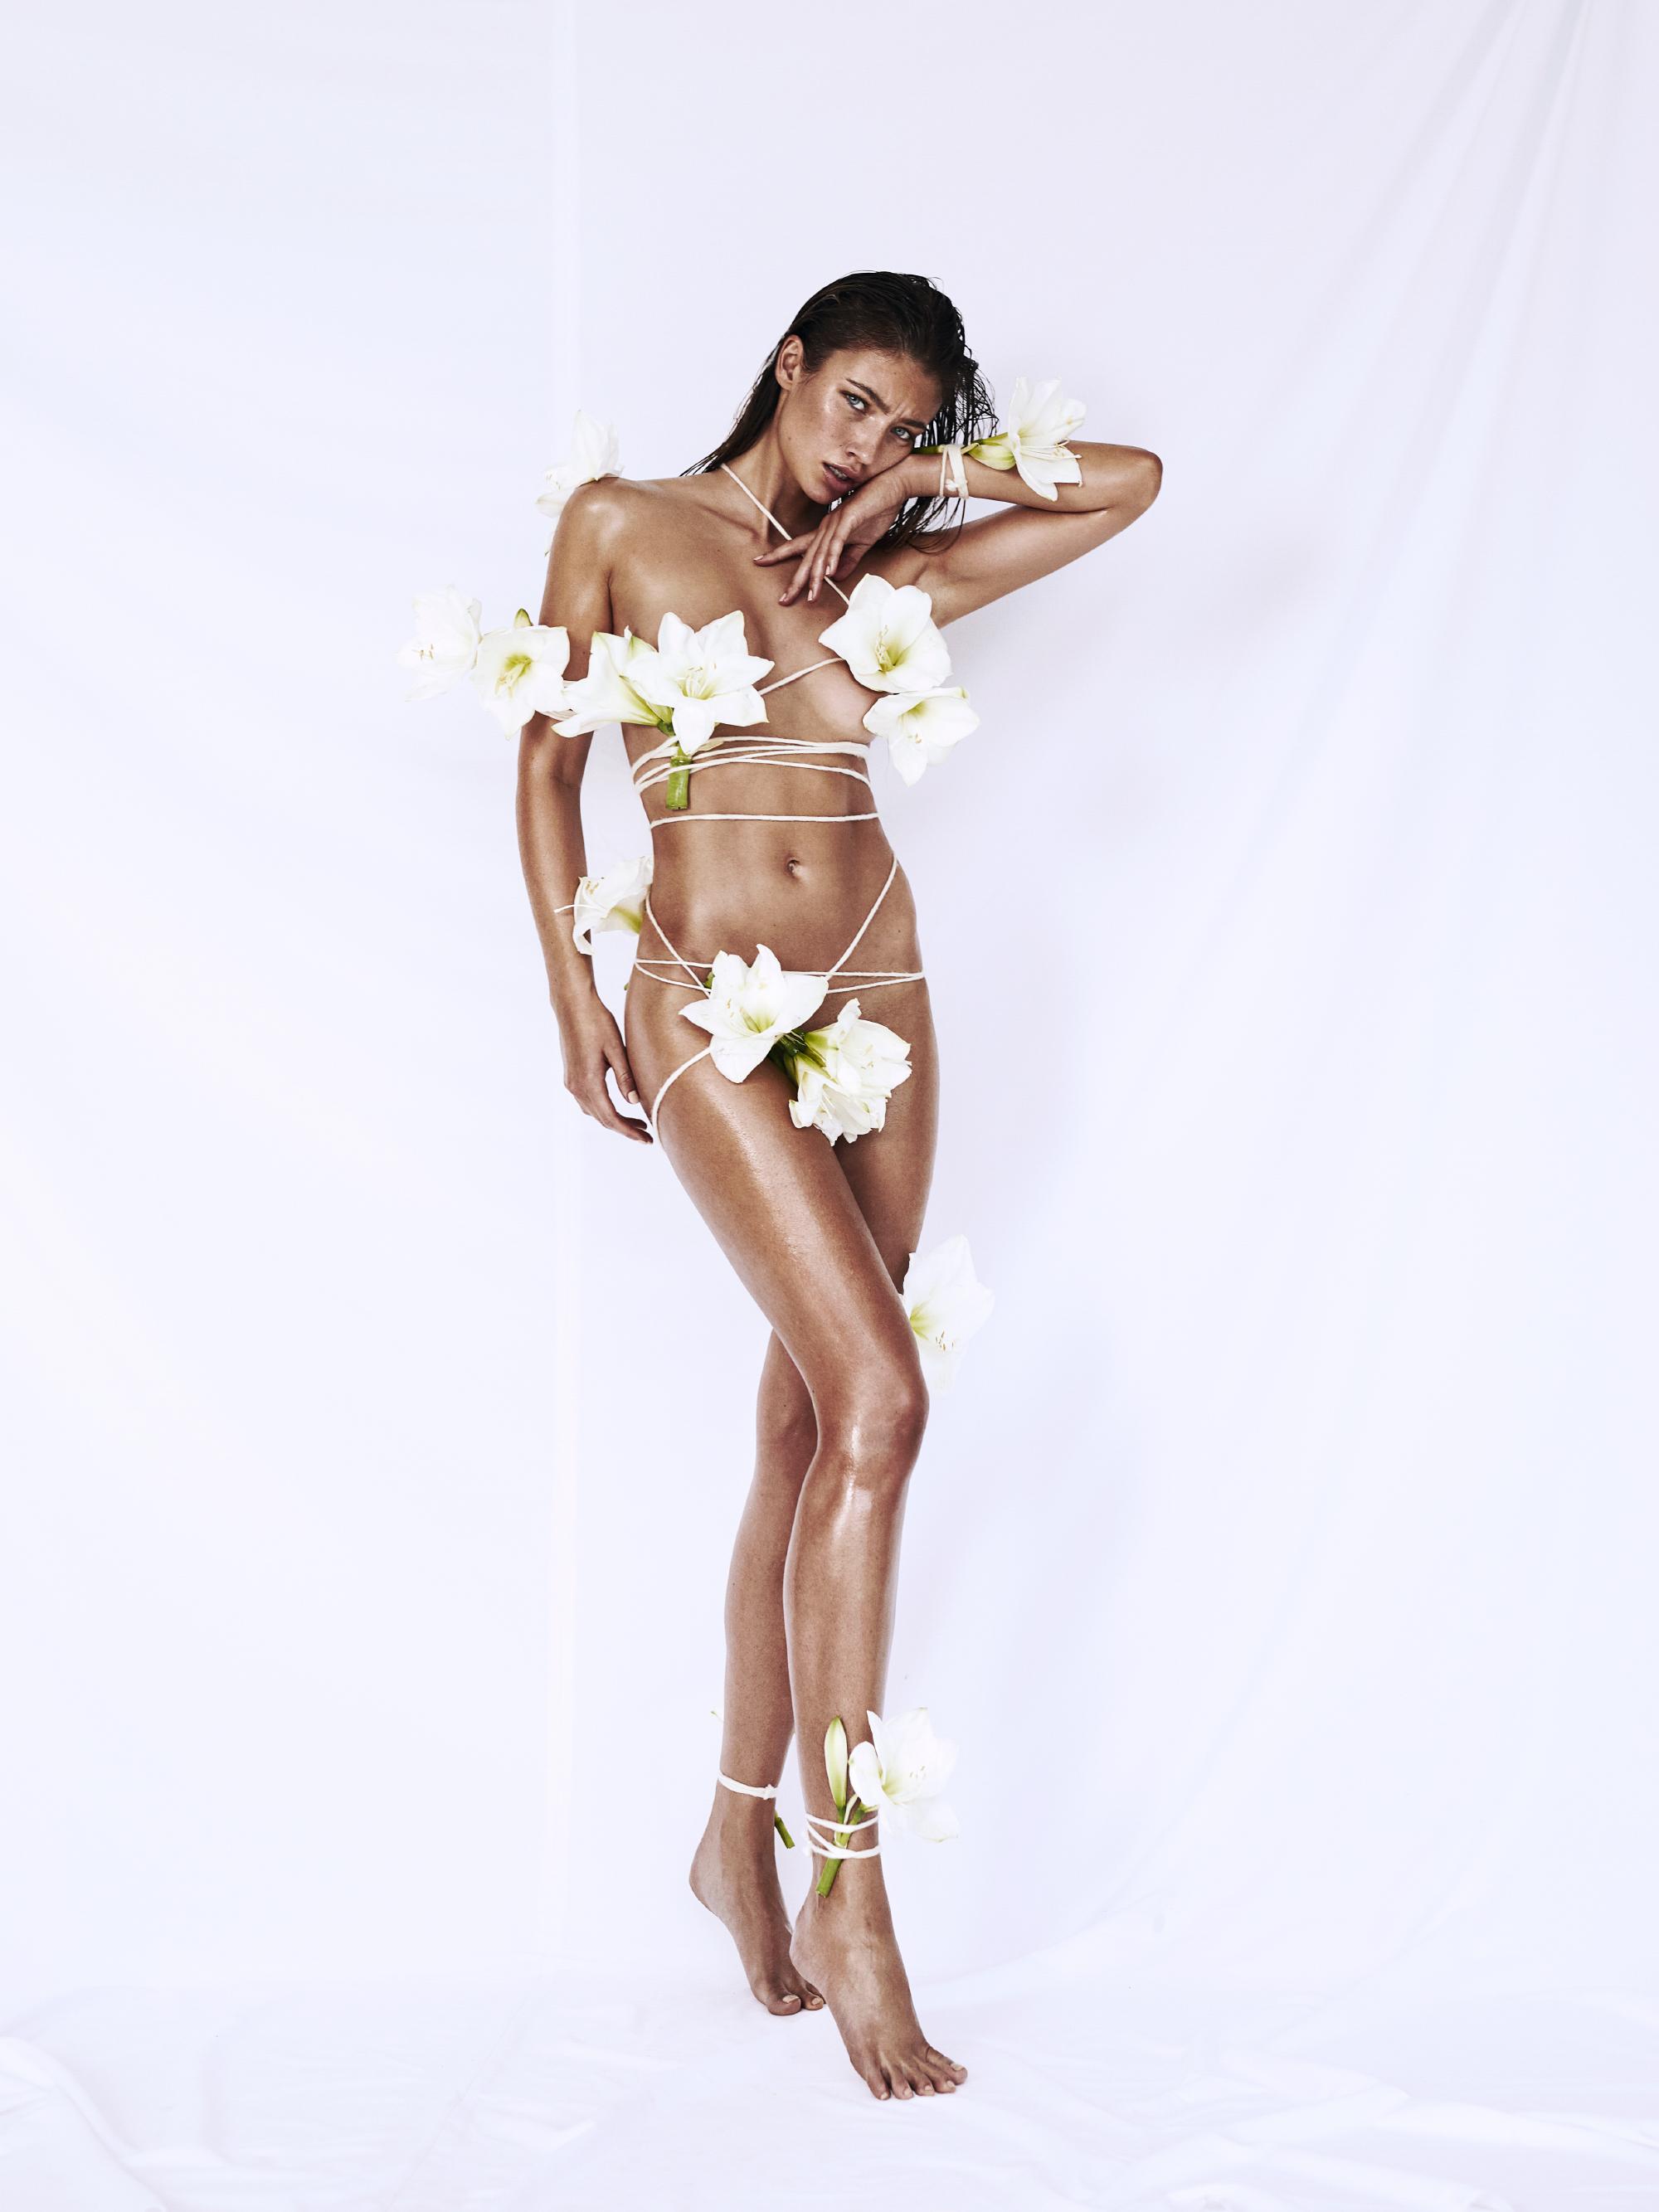 Lorena Rae Flowers